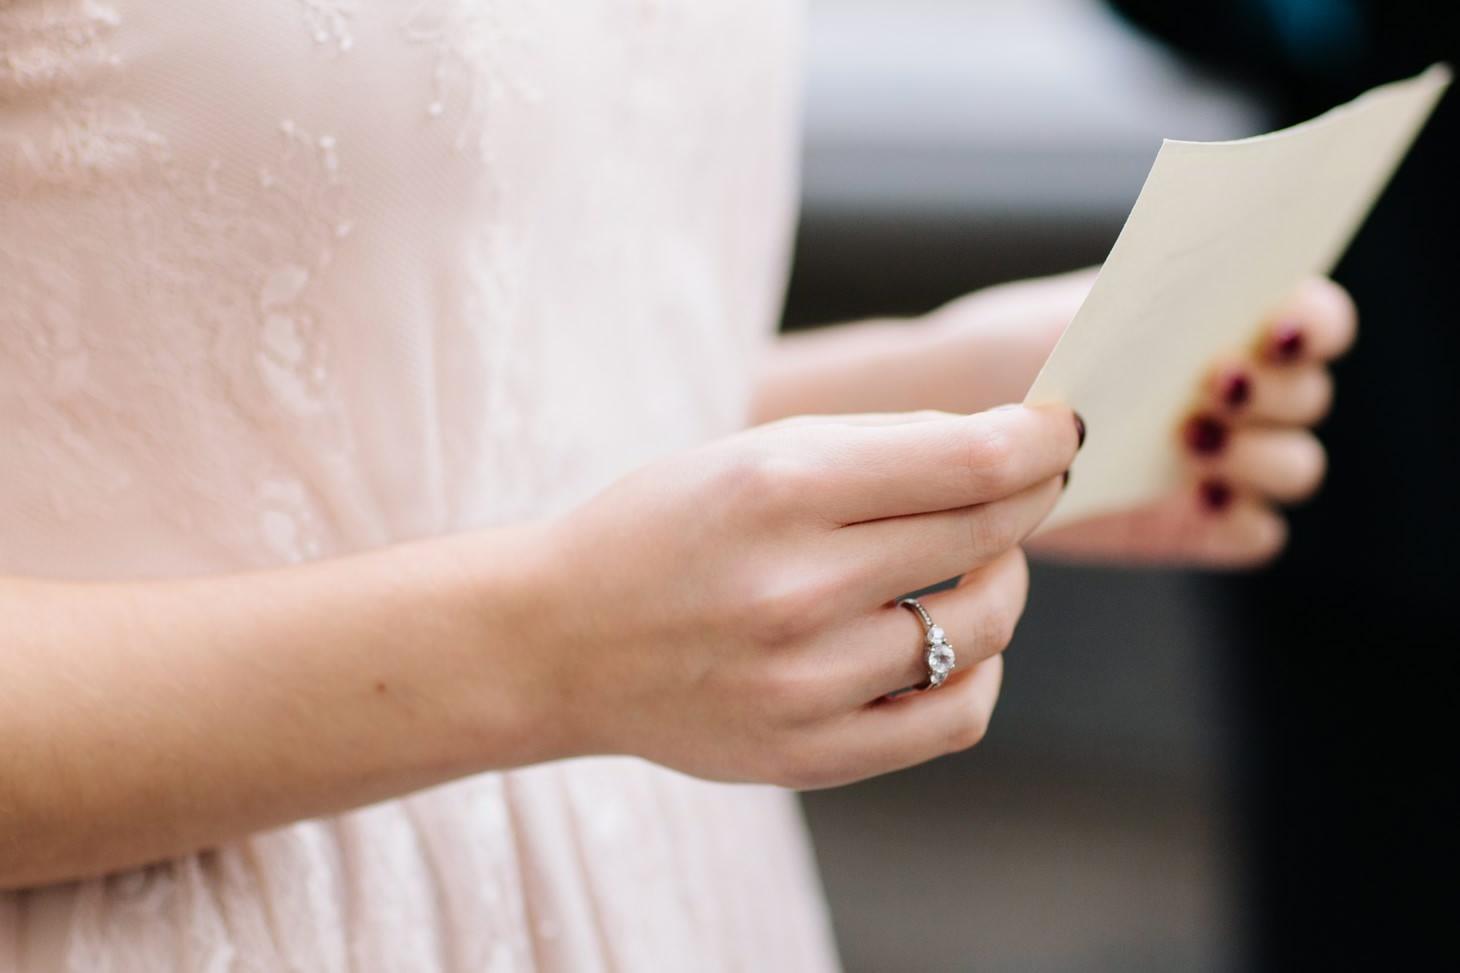 003-nyc-wedding-elopement-lgbt-friendly-photographer-city-hall-grand-central.jpg